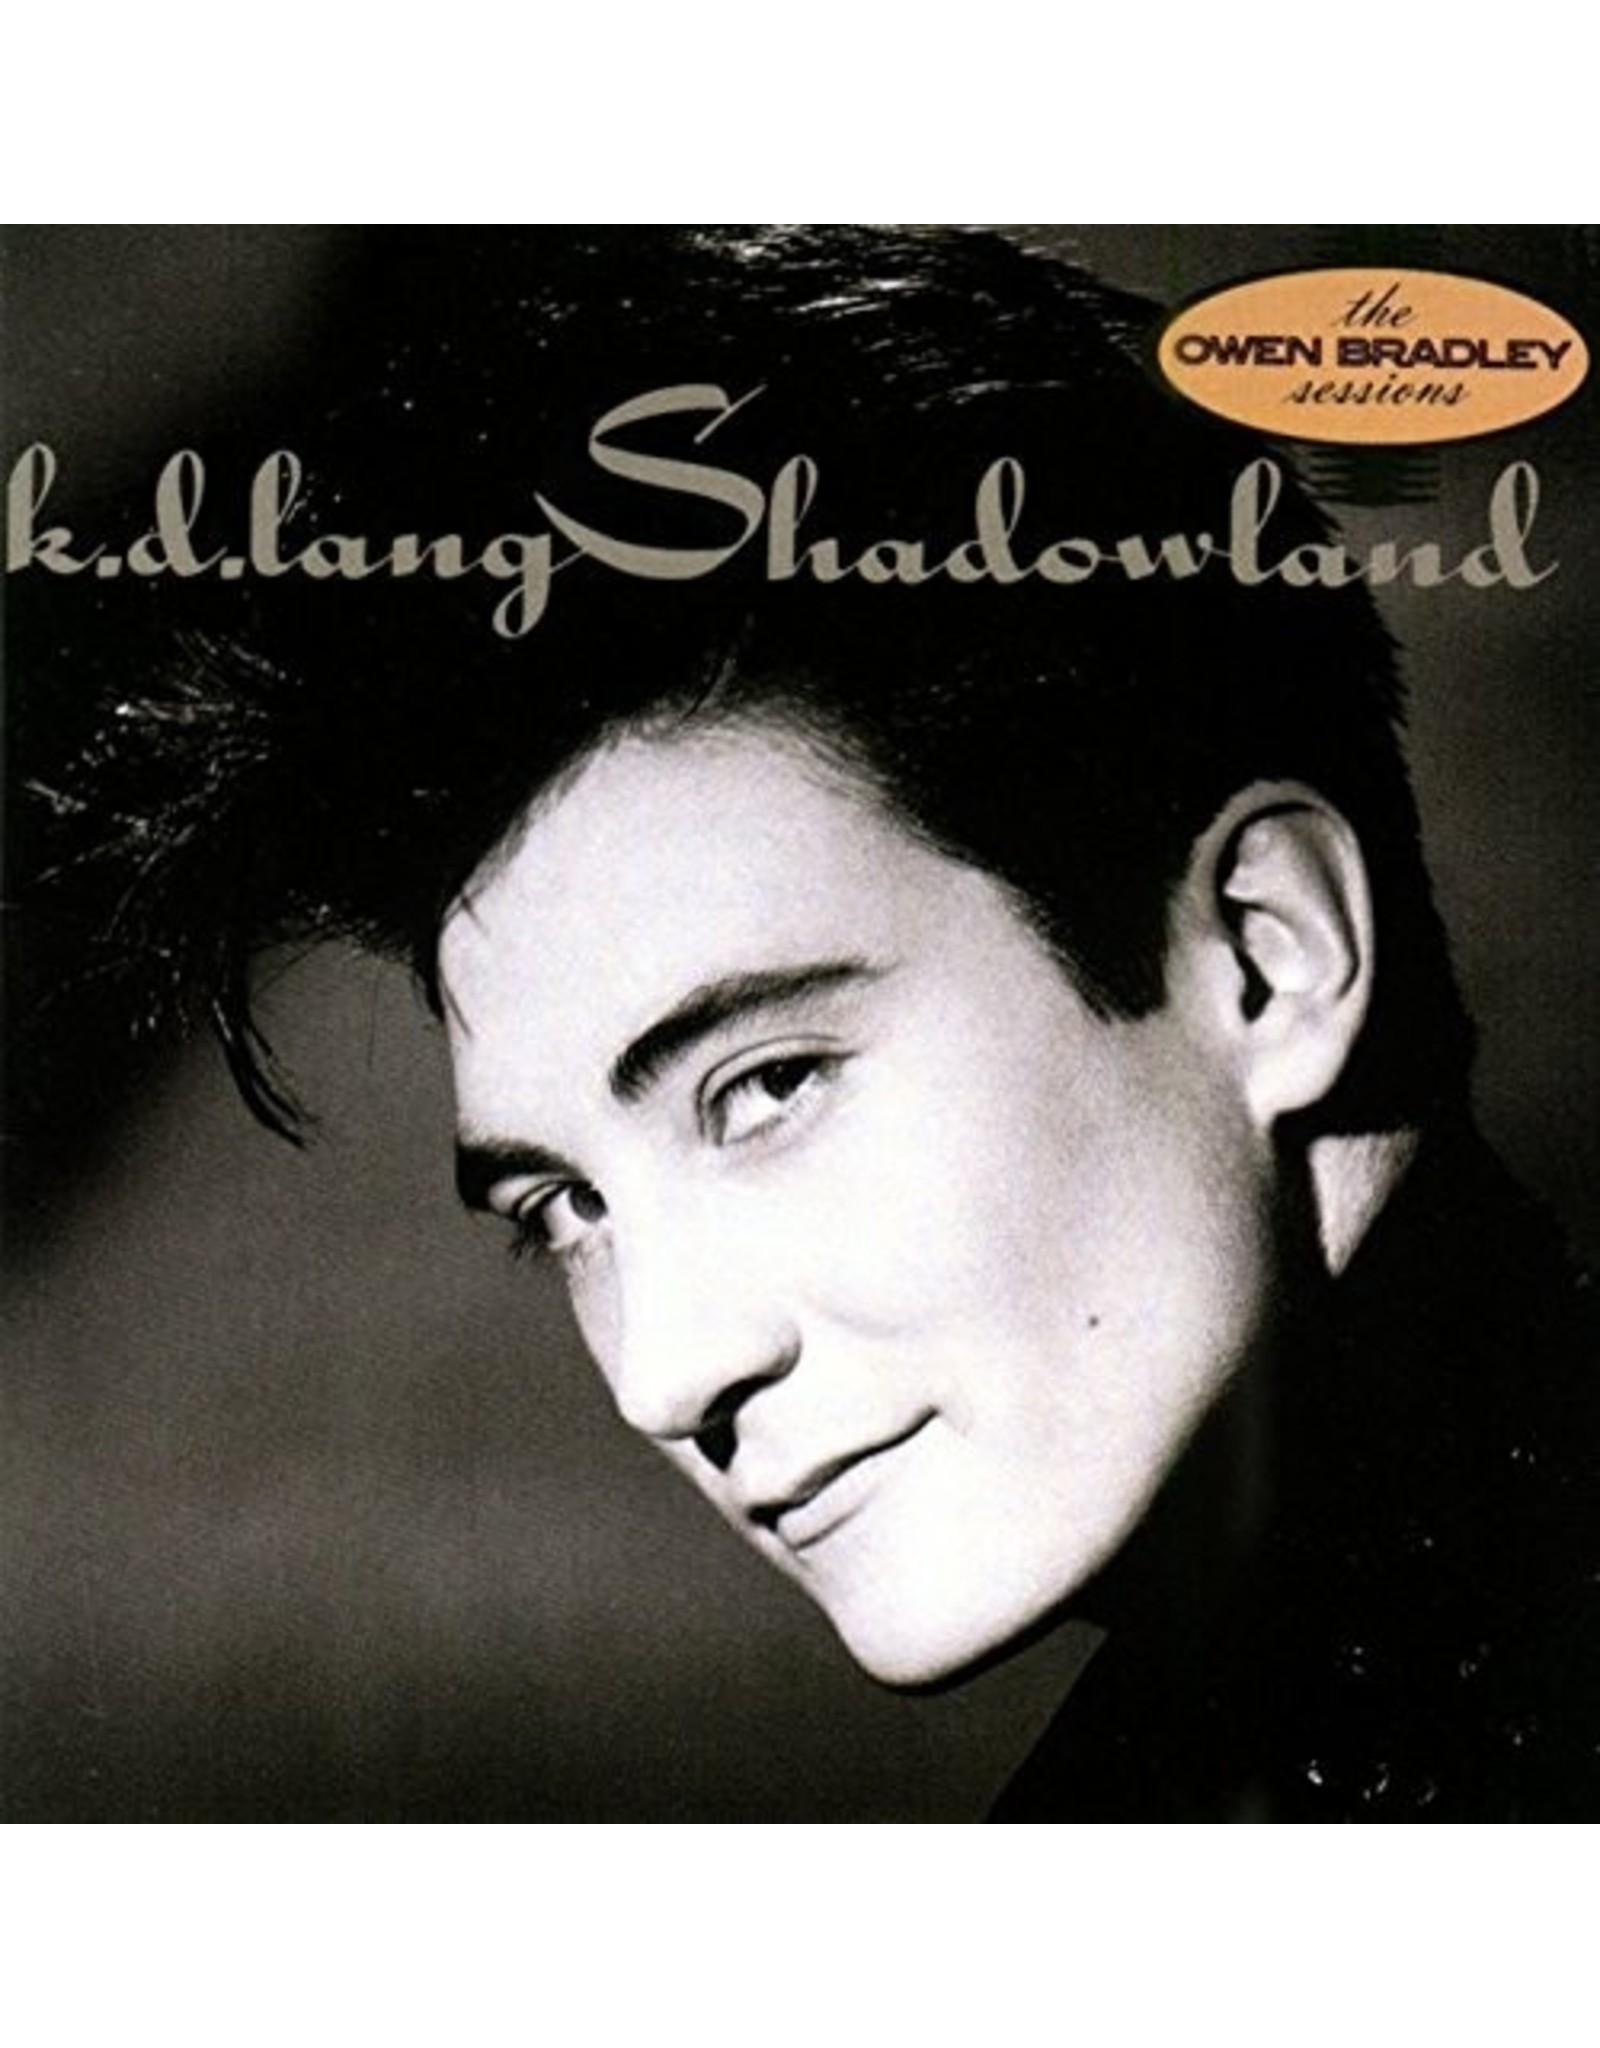 New Vinyl K.D. Lang - Shadowland LP